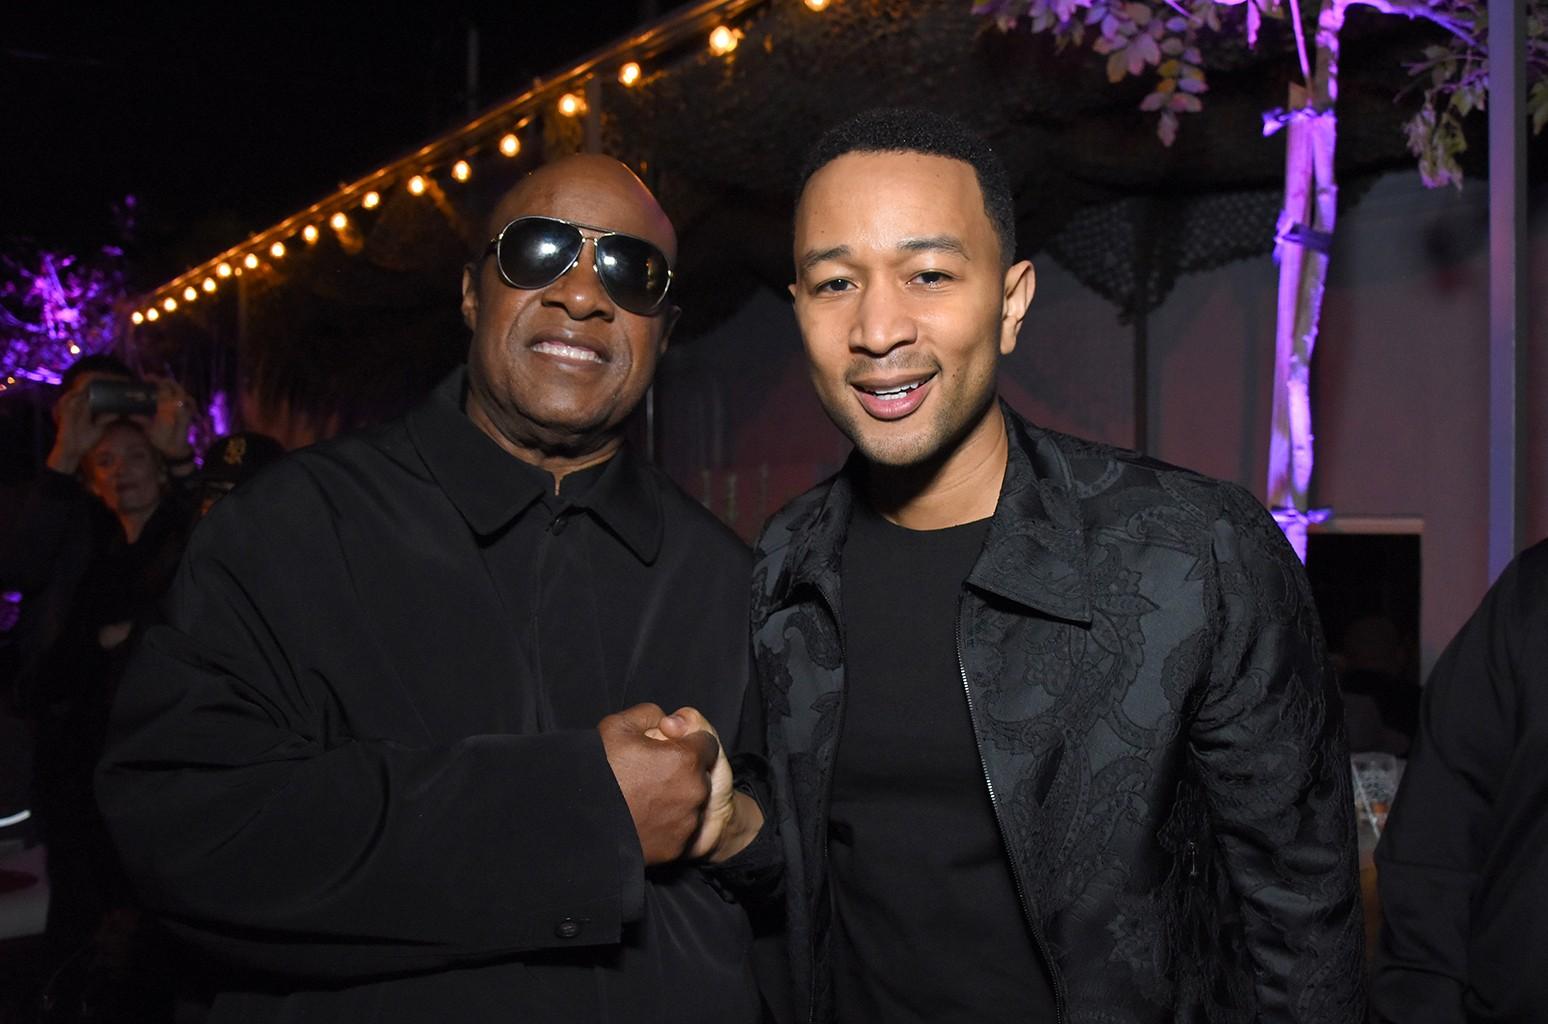 Stevie Wonder and John Legend